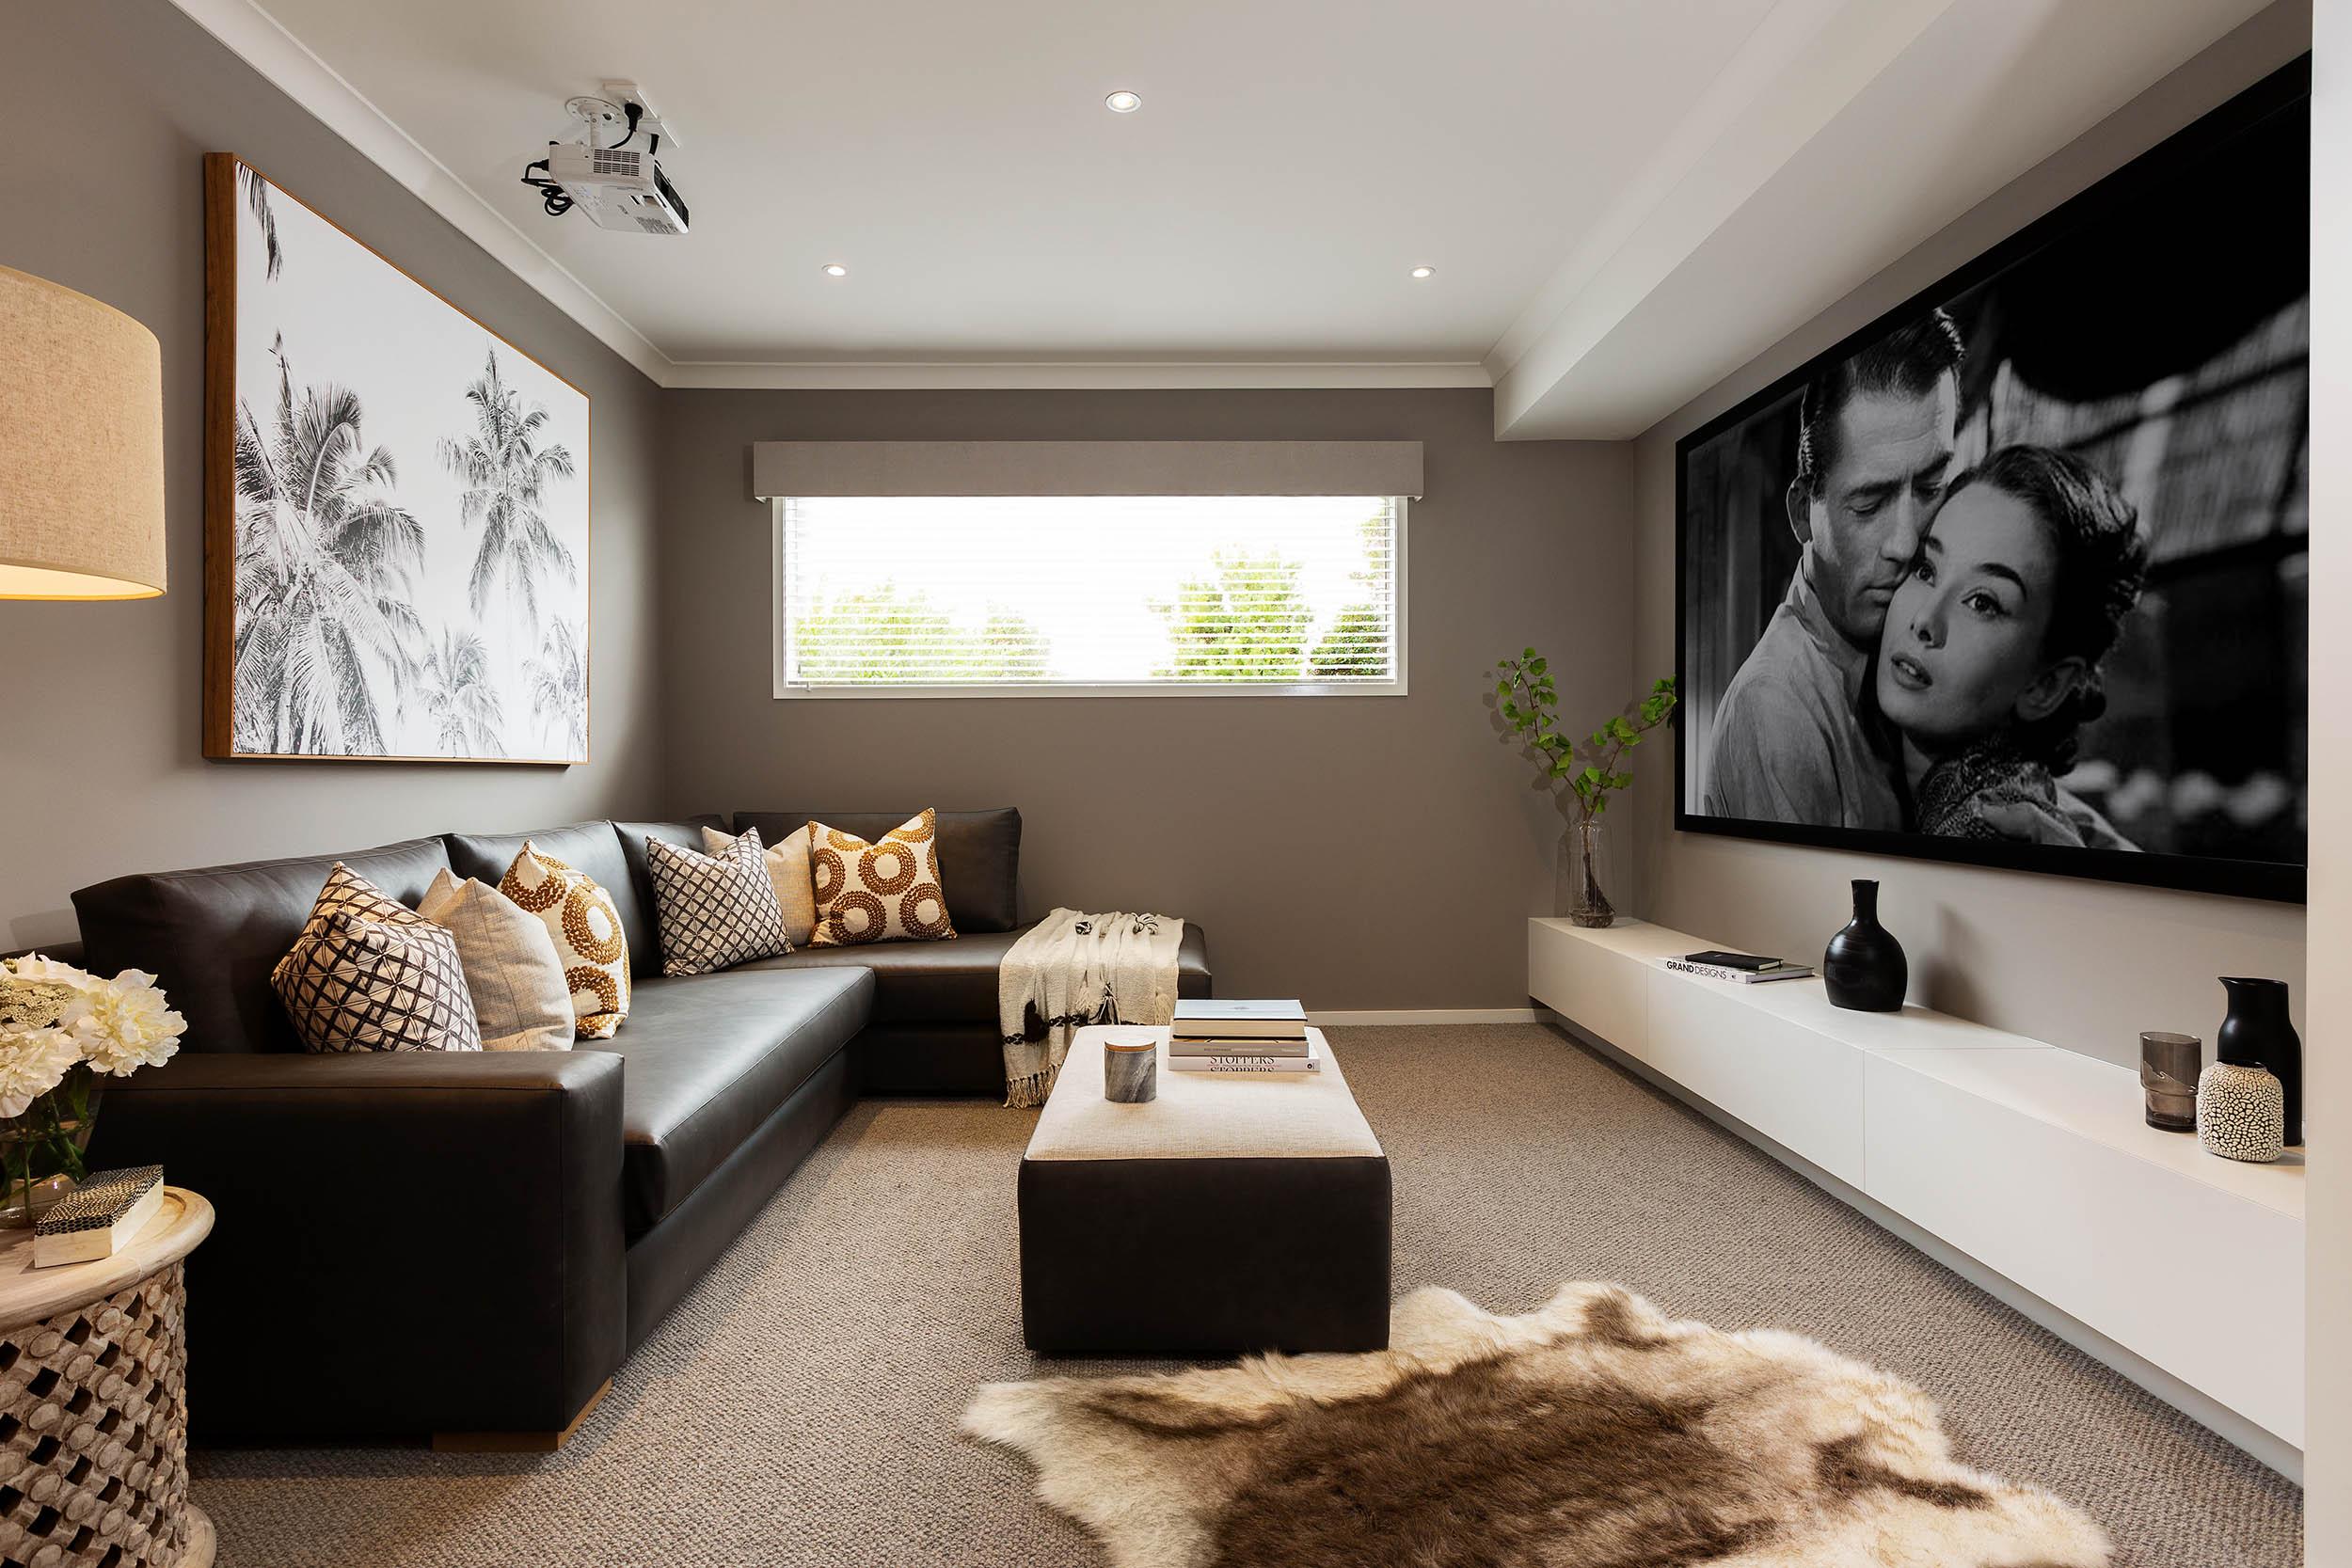 Carlisle Homes - Cloverton Estate, Kalkallo Kalkallo (03) 8691 1501